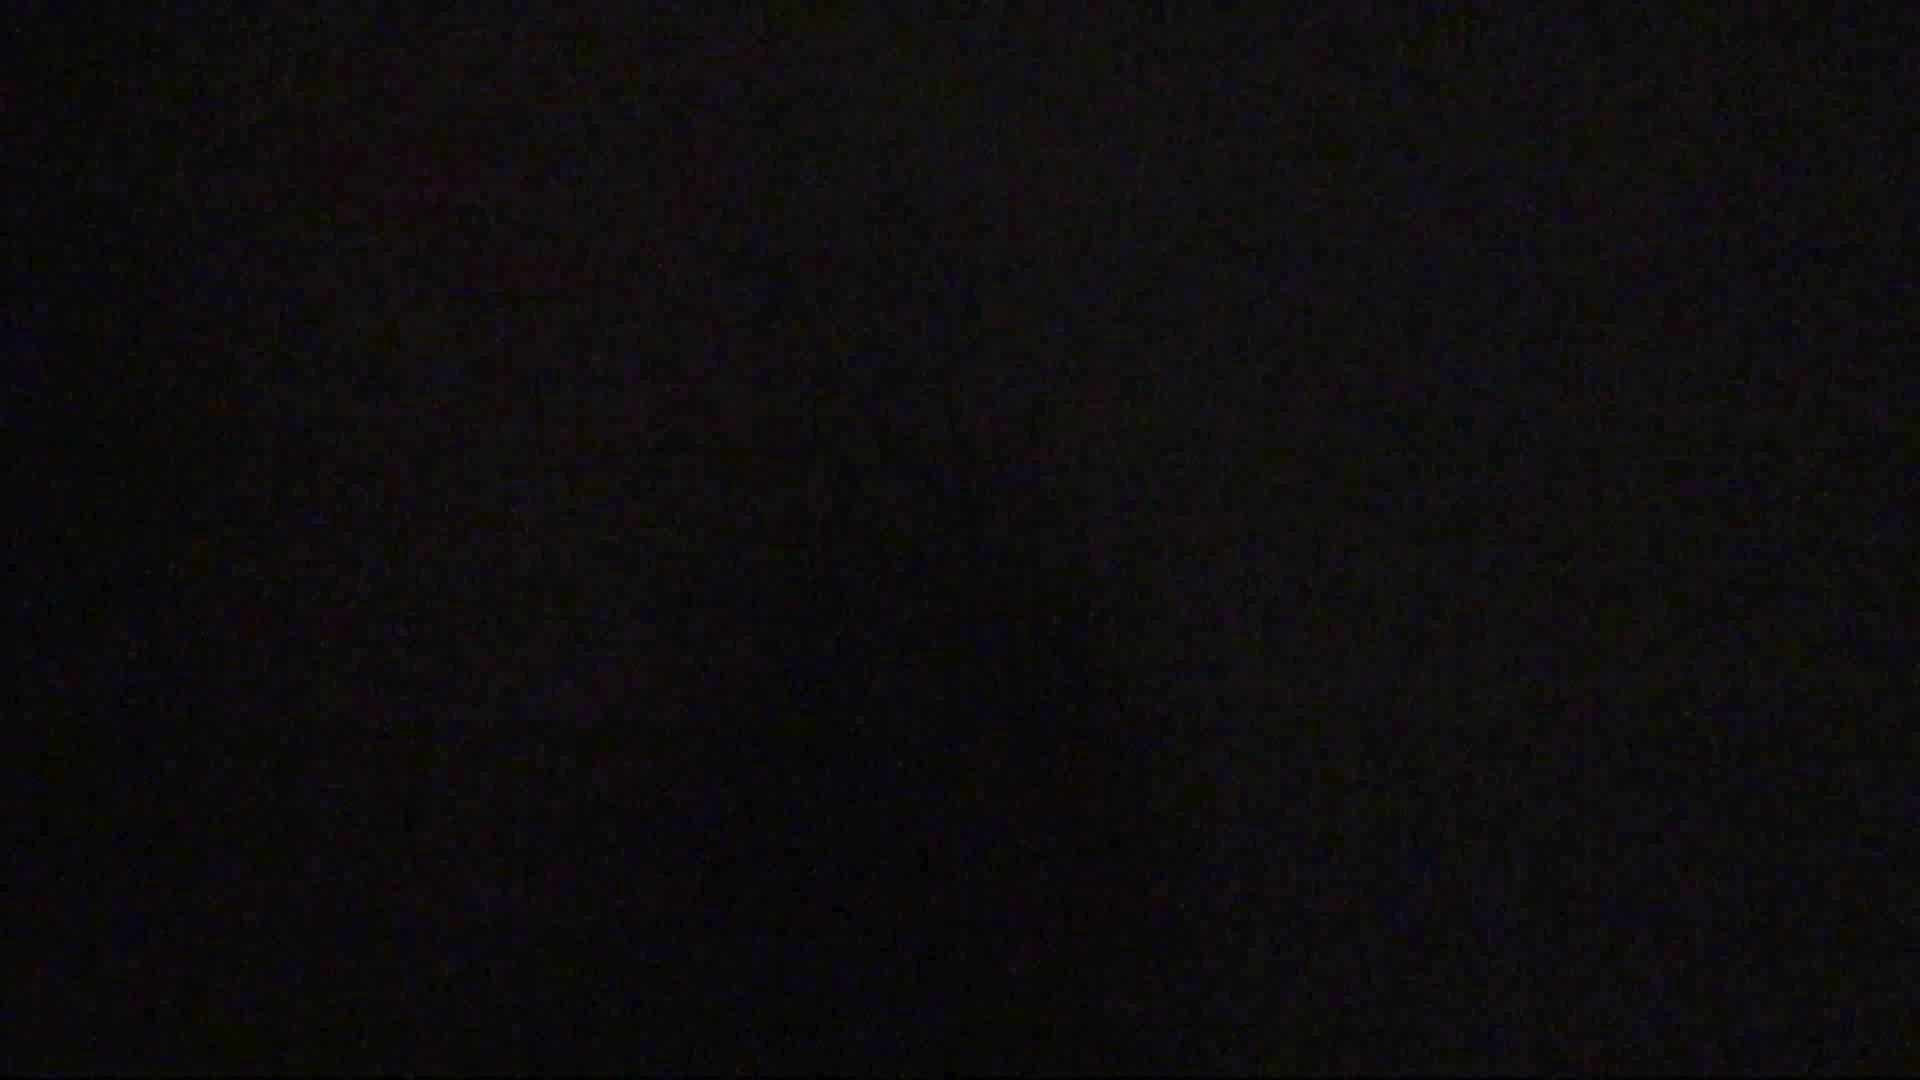 vol.02超可愛すぎる彼女の裸体をハイビジョンで!至近距離での眺め最高! むっちりガール アダルト動画キャプチャ 75枚 32